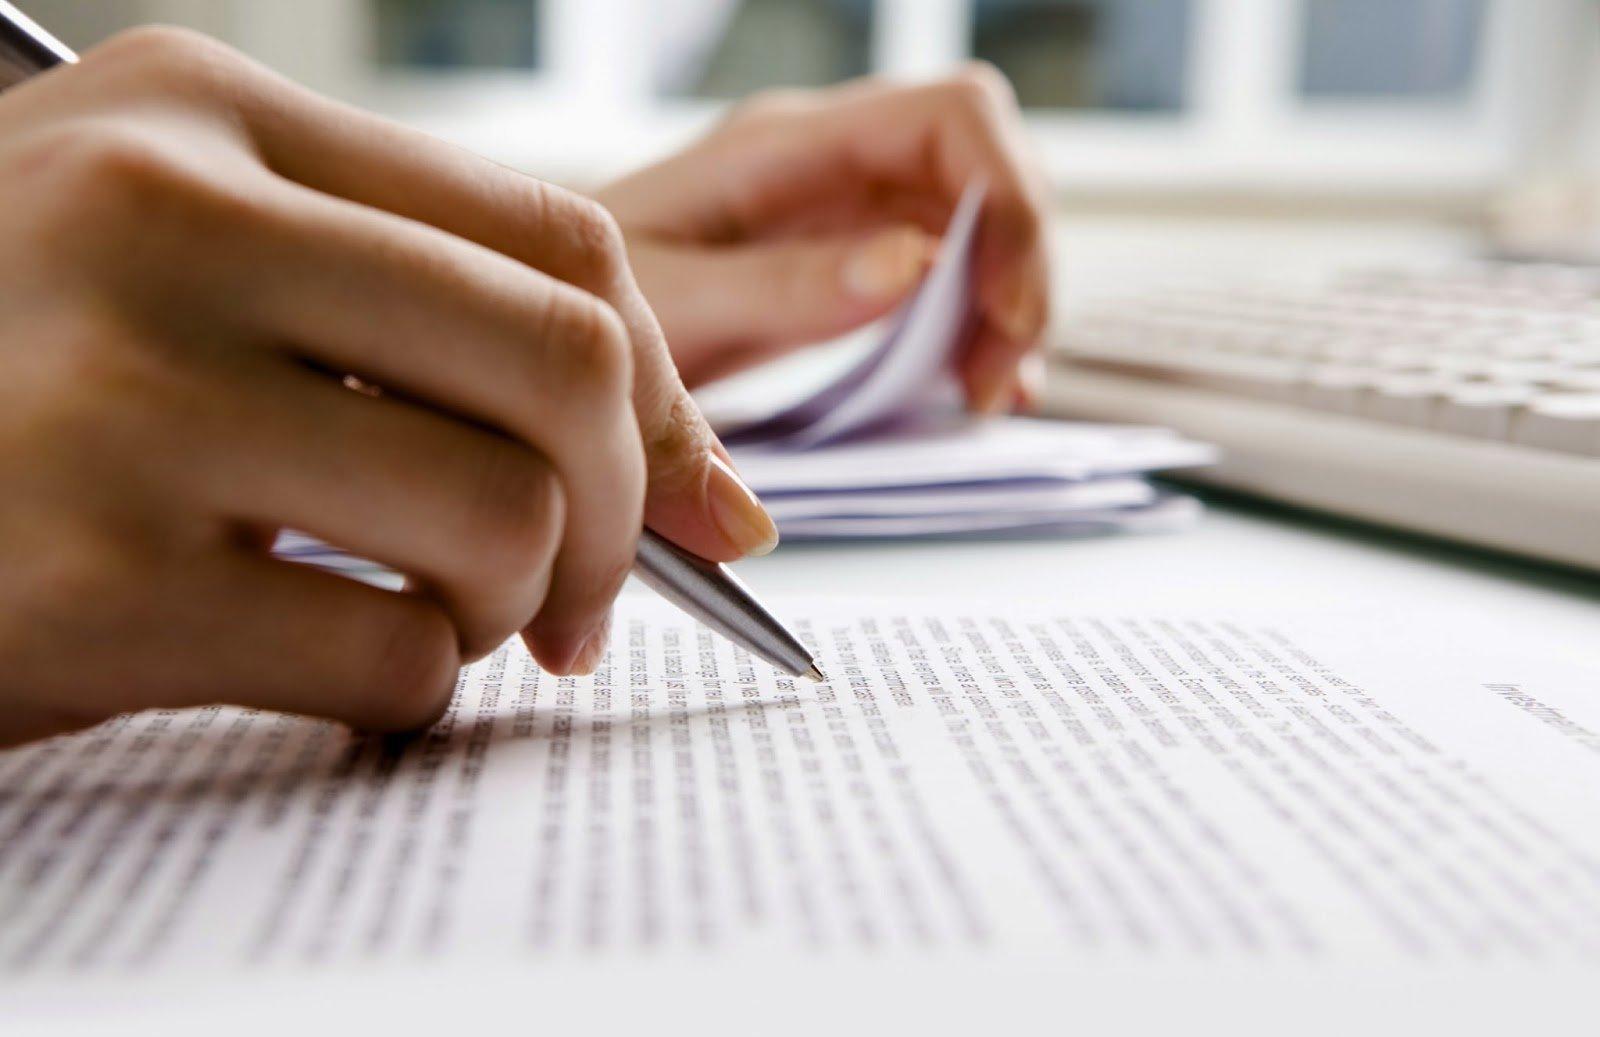 Technical report writing   Technical Report Writing Guidelines     A Technical Report Writing Manual   The Art of Chocolate Cake Kerrie Anne  Christian